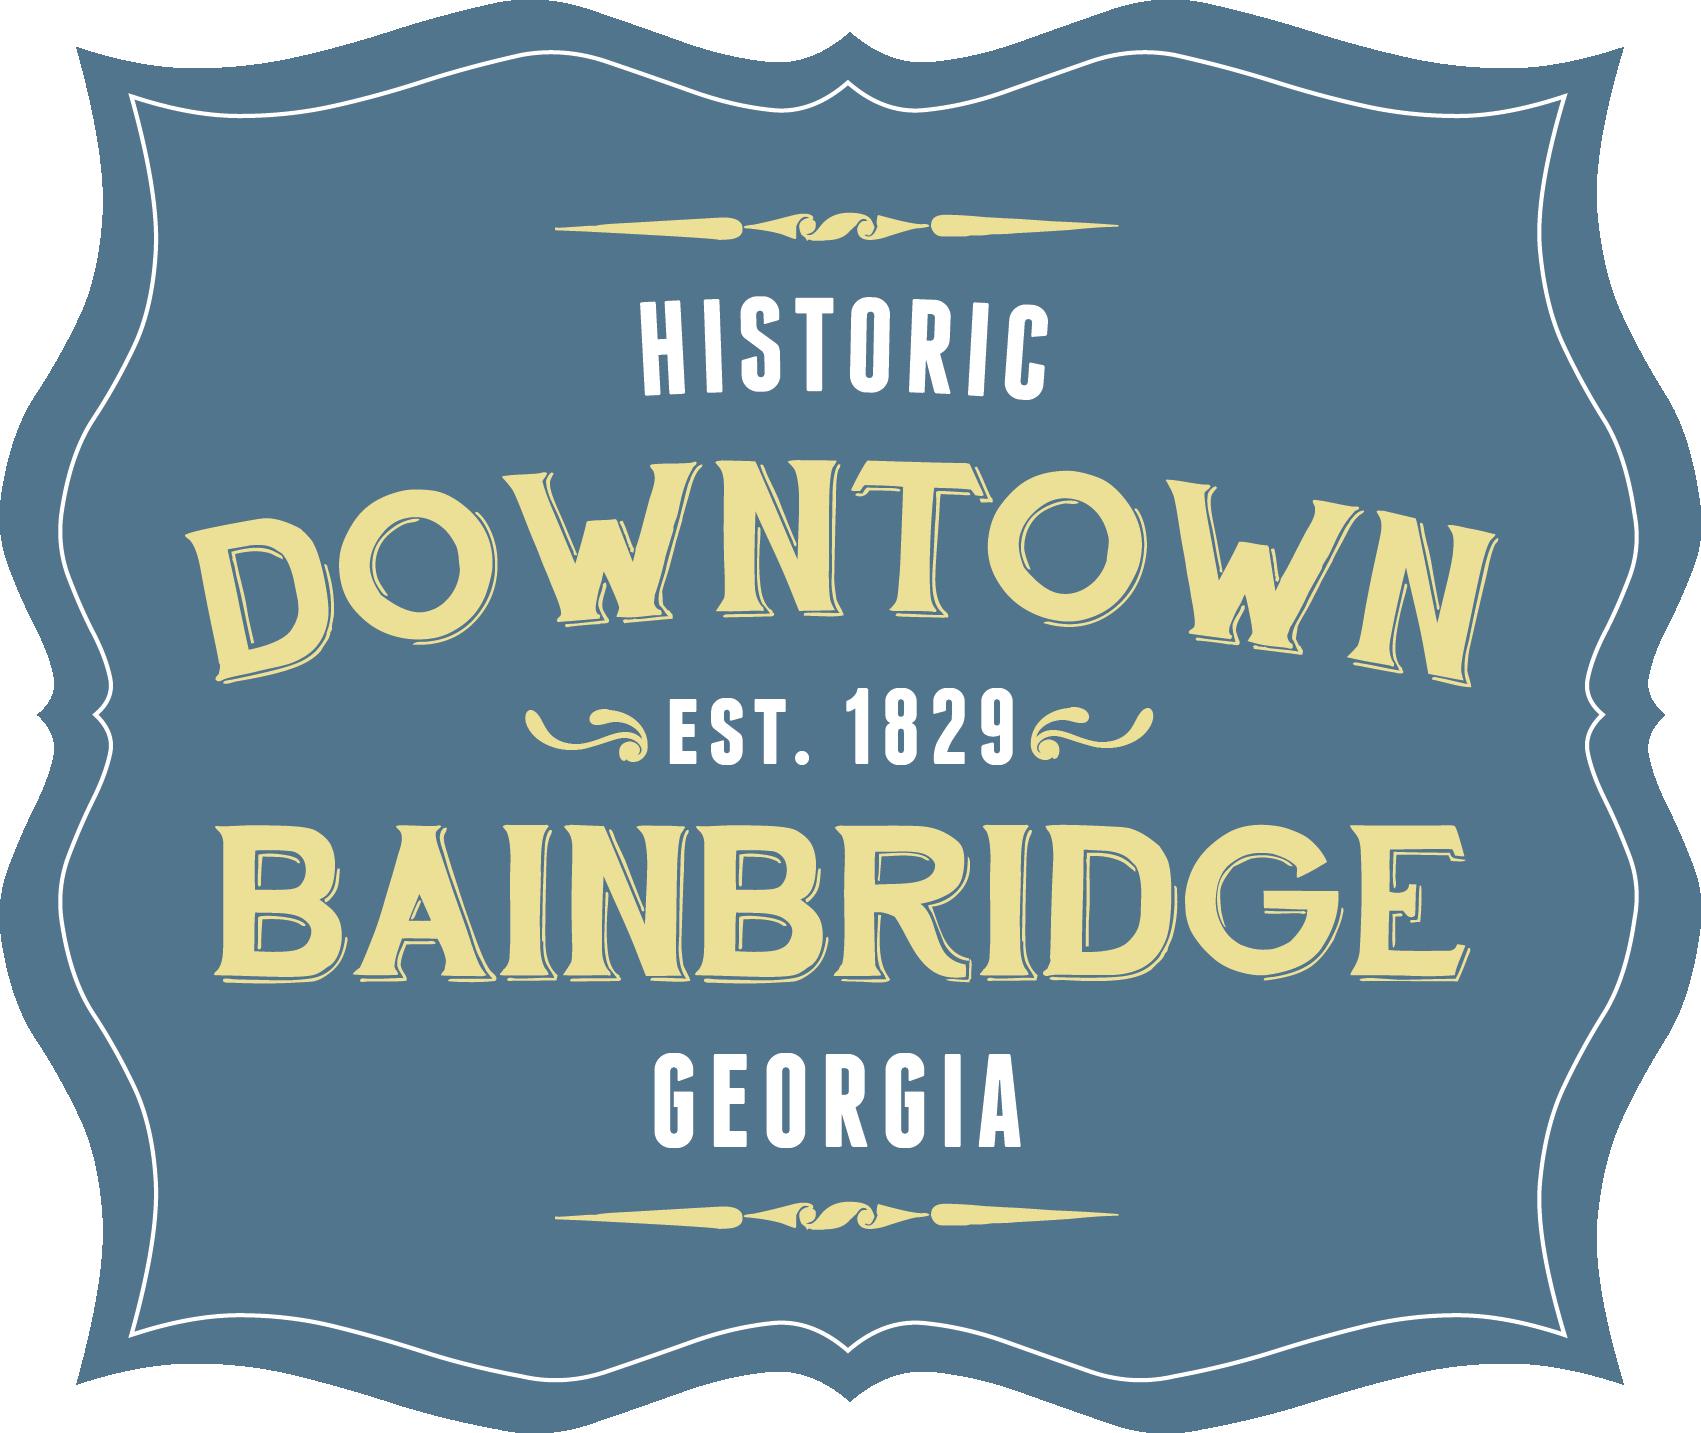 Downtown Bainbridge